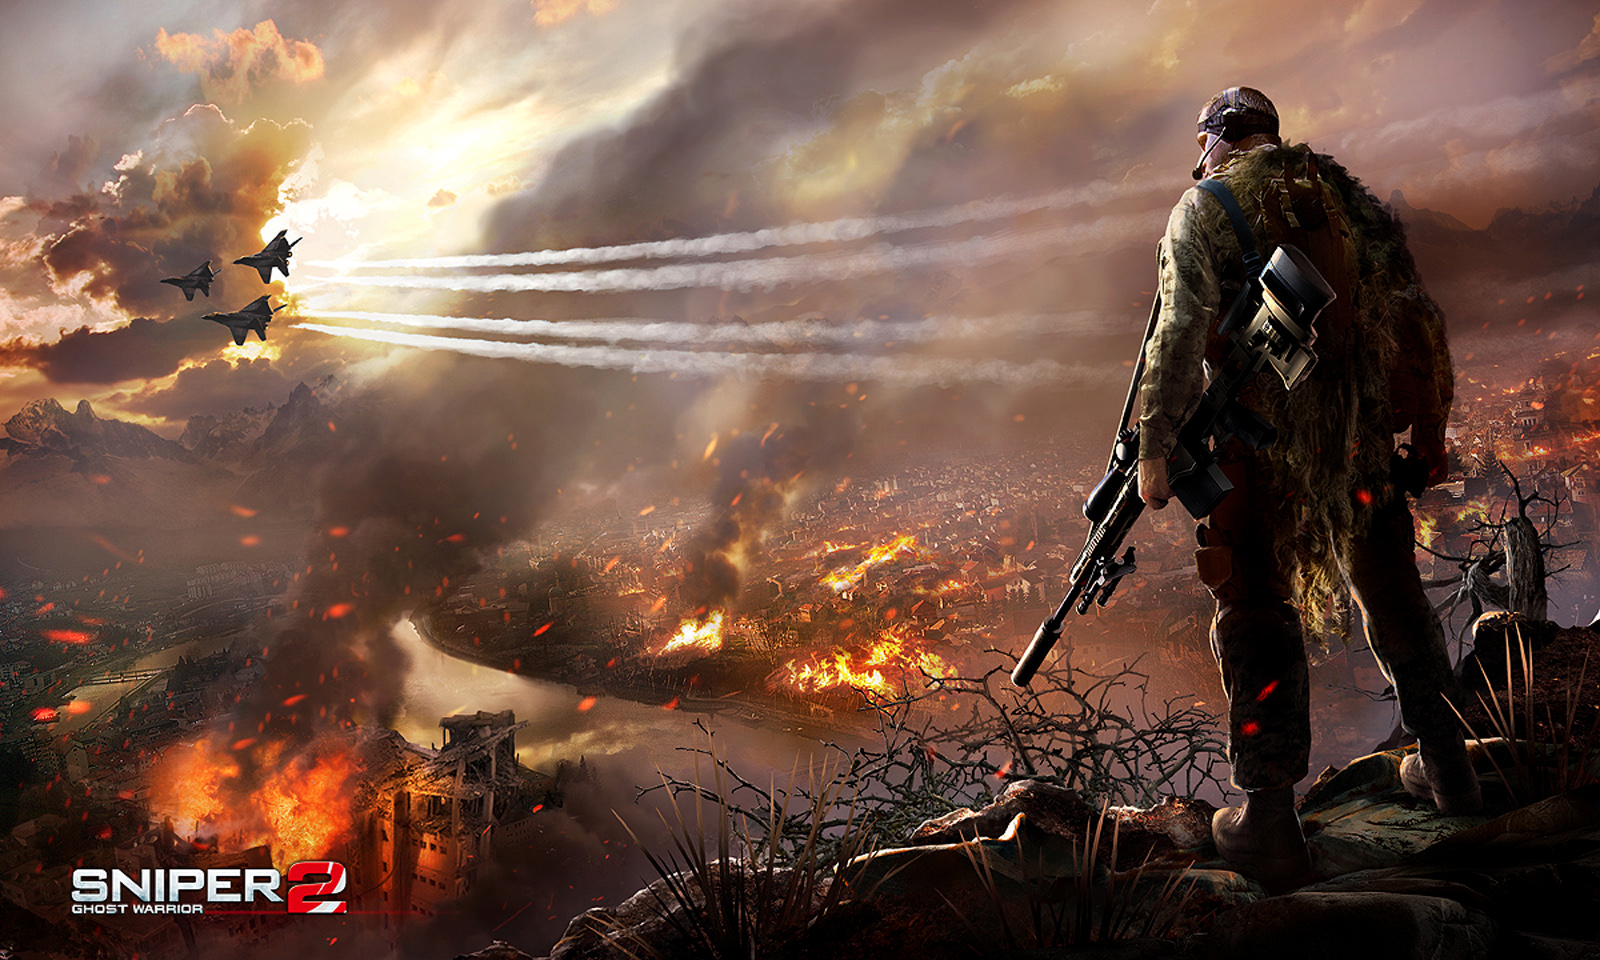 http://2.bp.blogspot.com/-eZyEJDe7anQ/T2tPCG8cuoI/AAAAAAAAA8c/nlTFmwf3pCU/s1600/Sniper_Ghost_Warrior_2_HD_Wallpaper-gWb.jpg